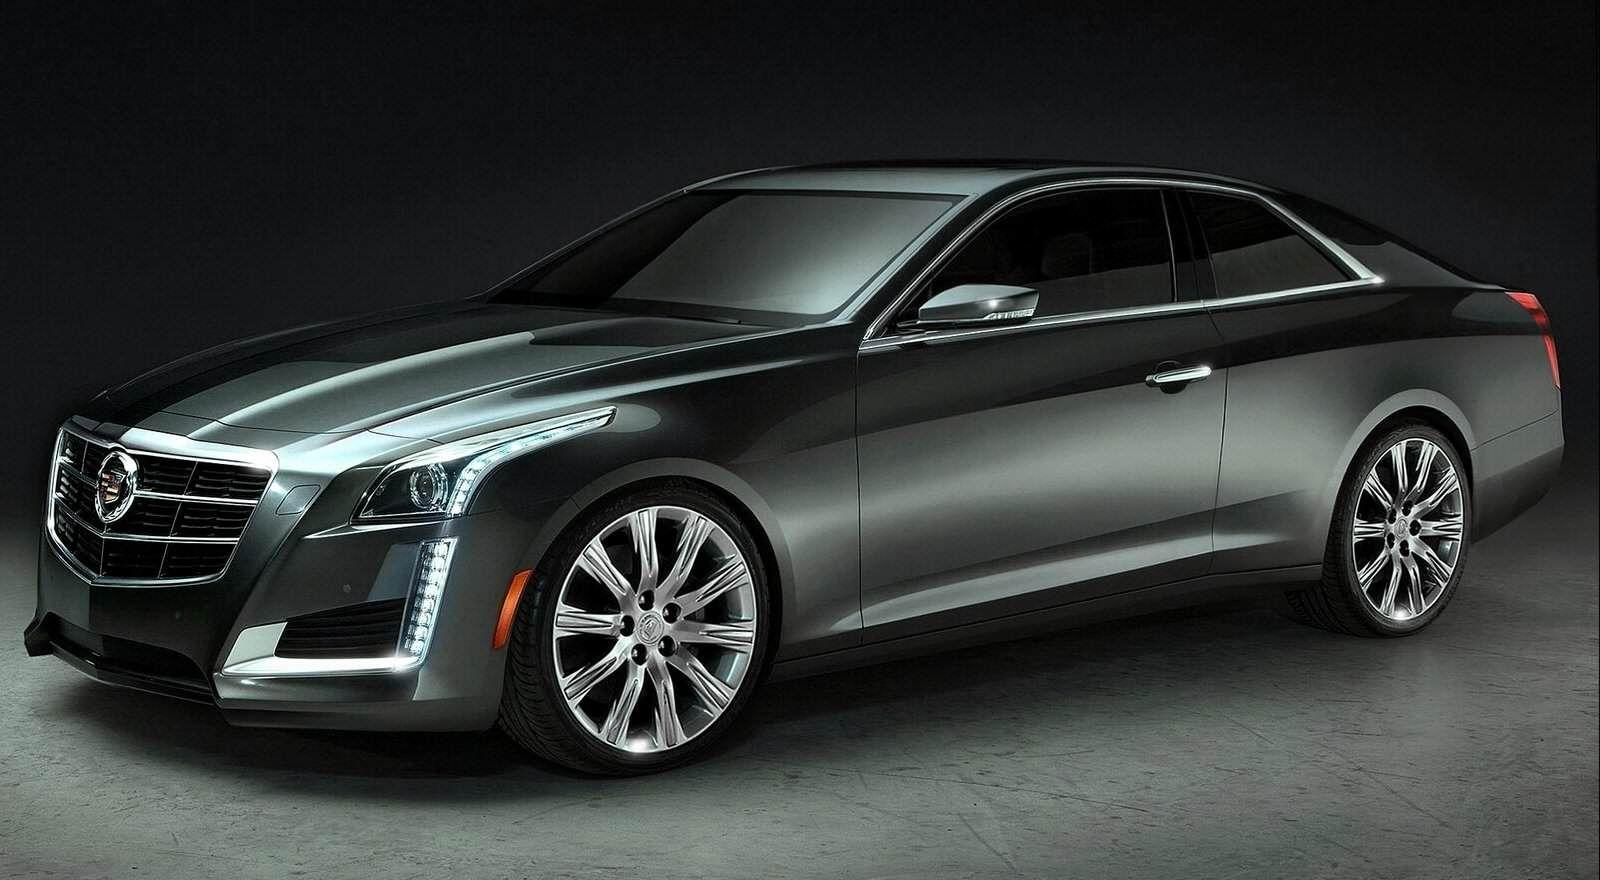 Cadillac Xts On Rims Lugs on cadillac xts  carz  Pinterest